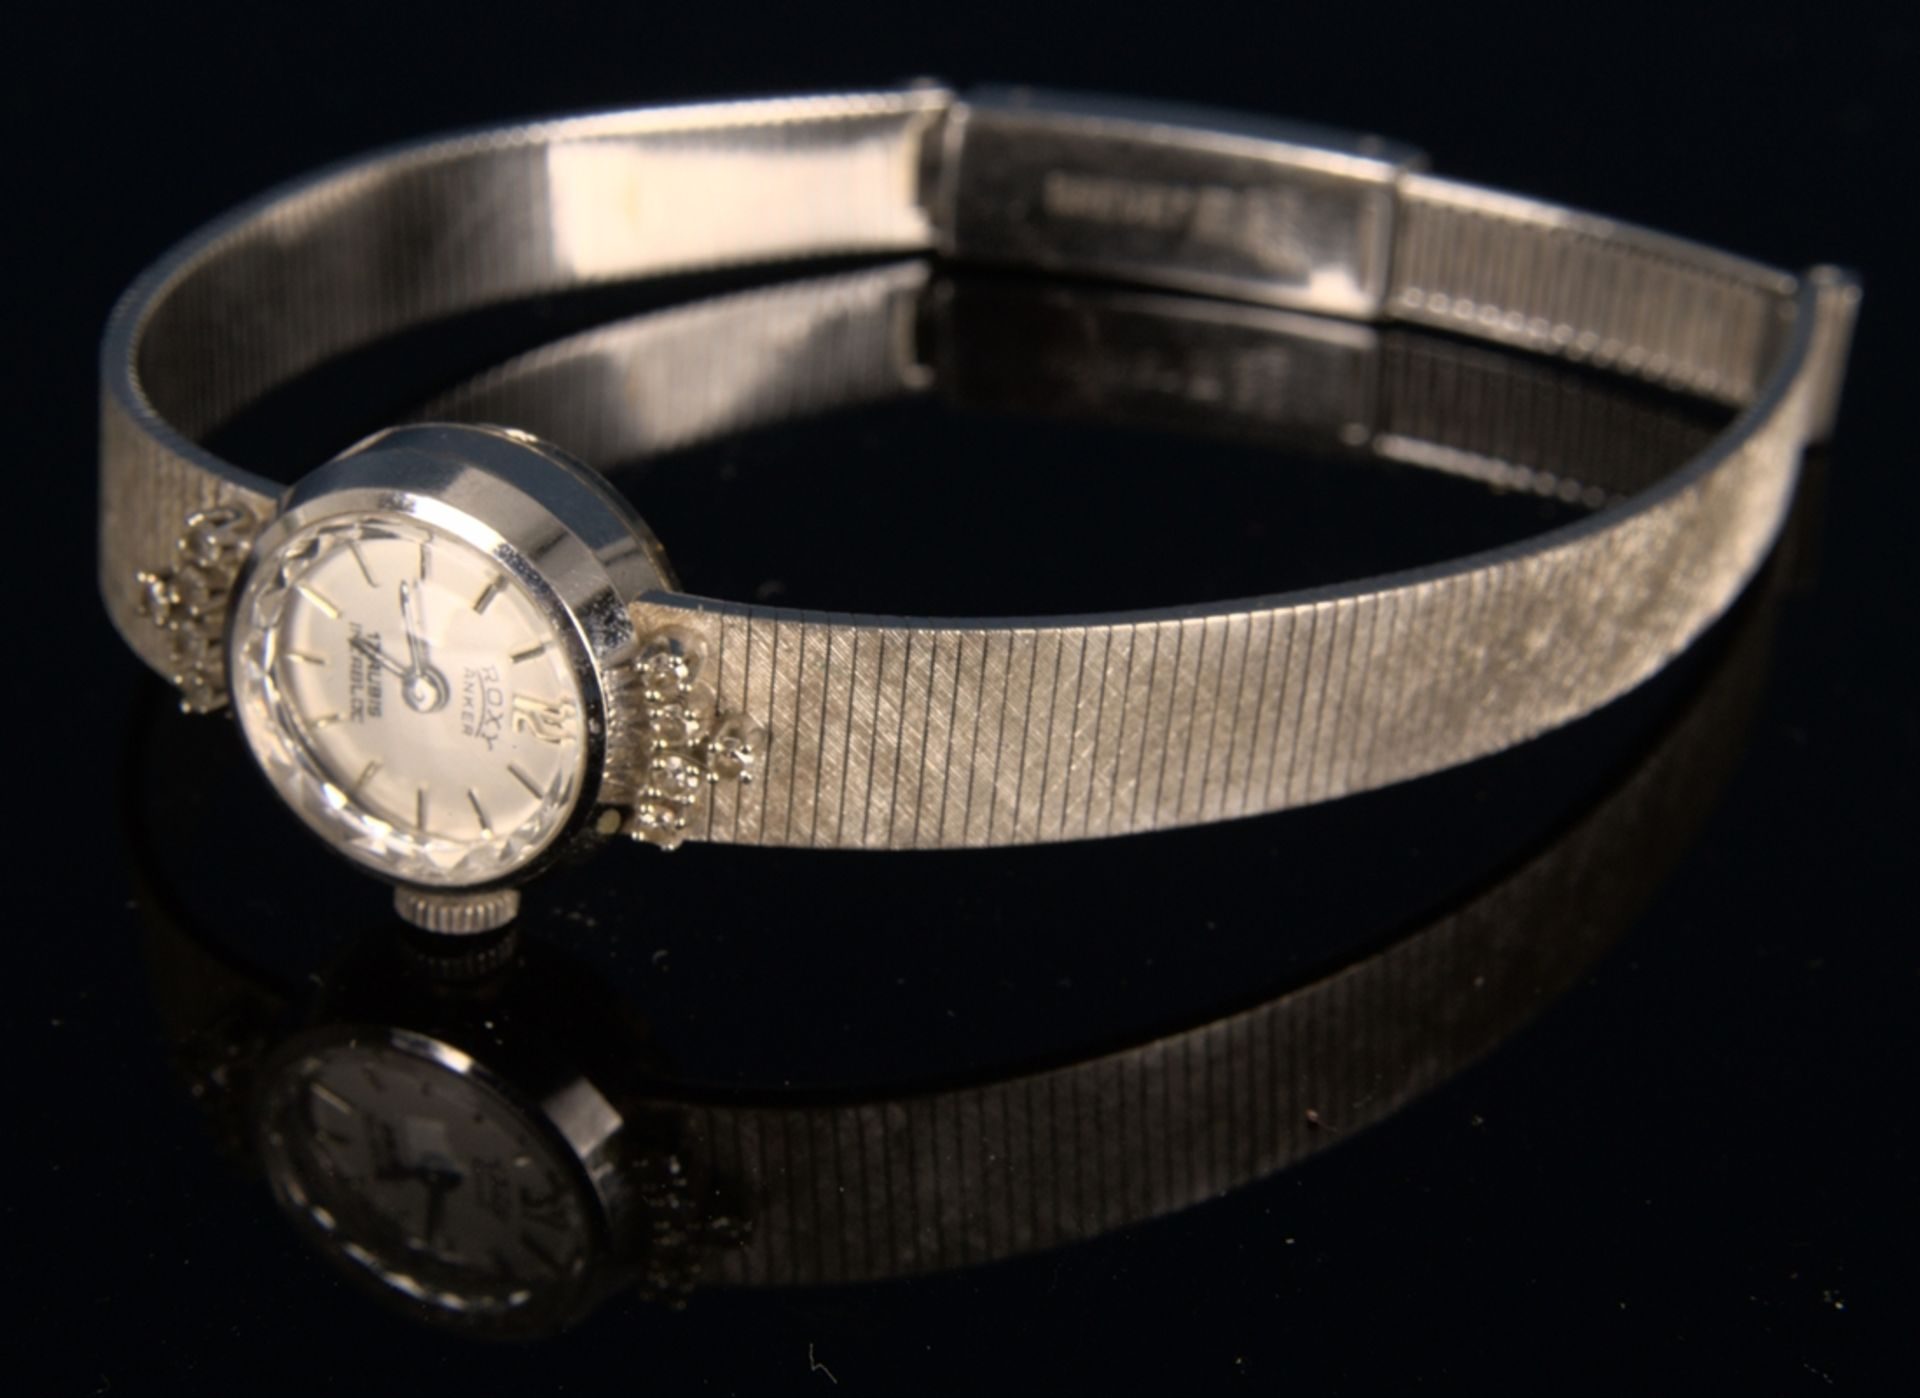 "Elegante COCKTAIL - Damenarmbanduhr der Marke ""ANKER - ROXY"" - 17 Rubis - Incabloc. Handaufzug, - Bild 9 aus 11"